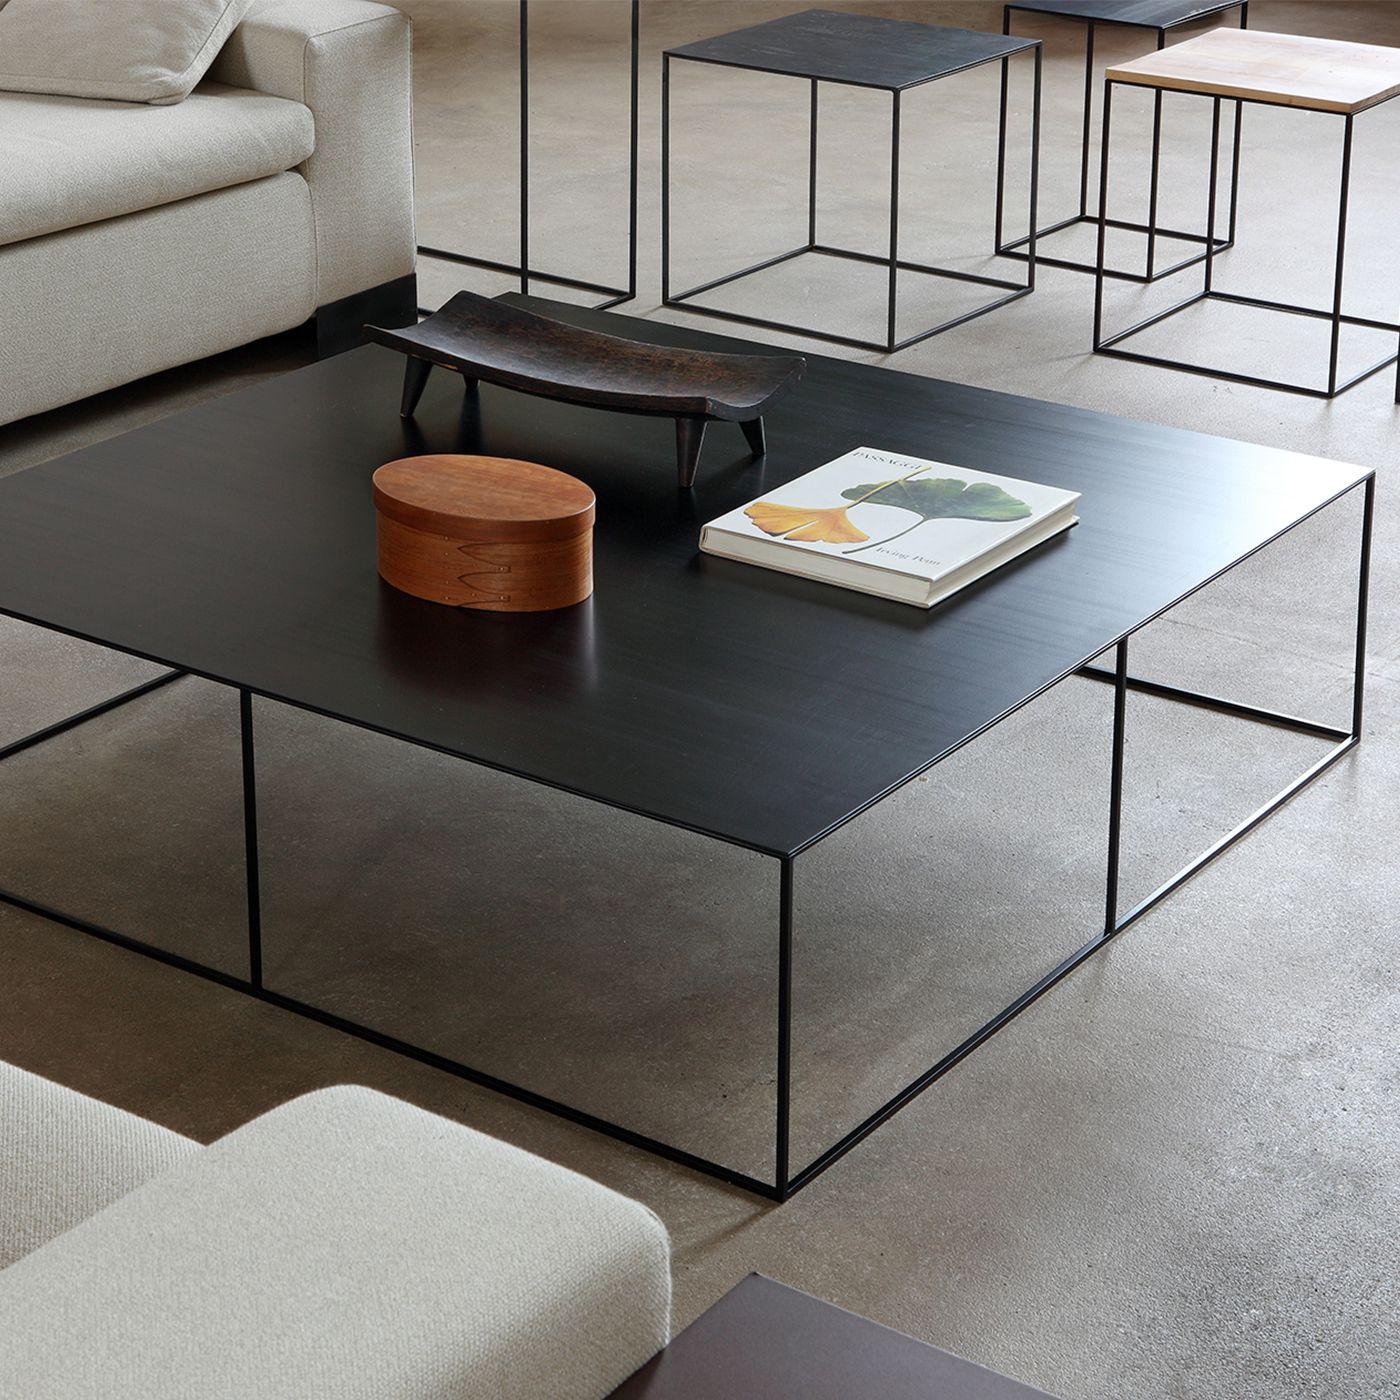 Slim Irony Large Coffee Table Coffee Table Coffee Table Design Small Coffee Table [ 1400 x 1400 Pixel ]